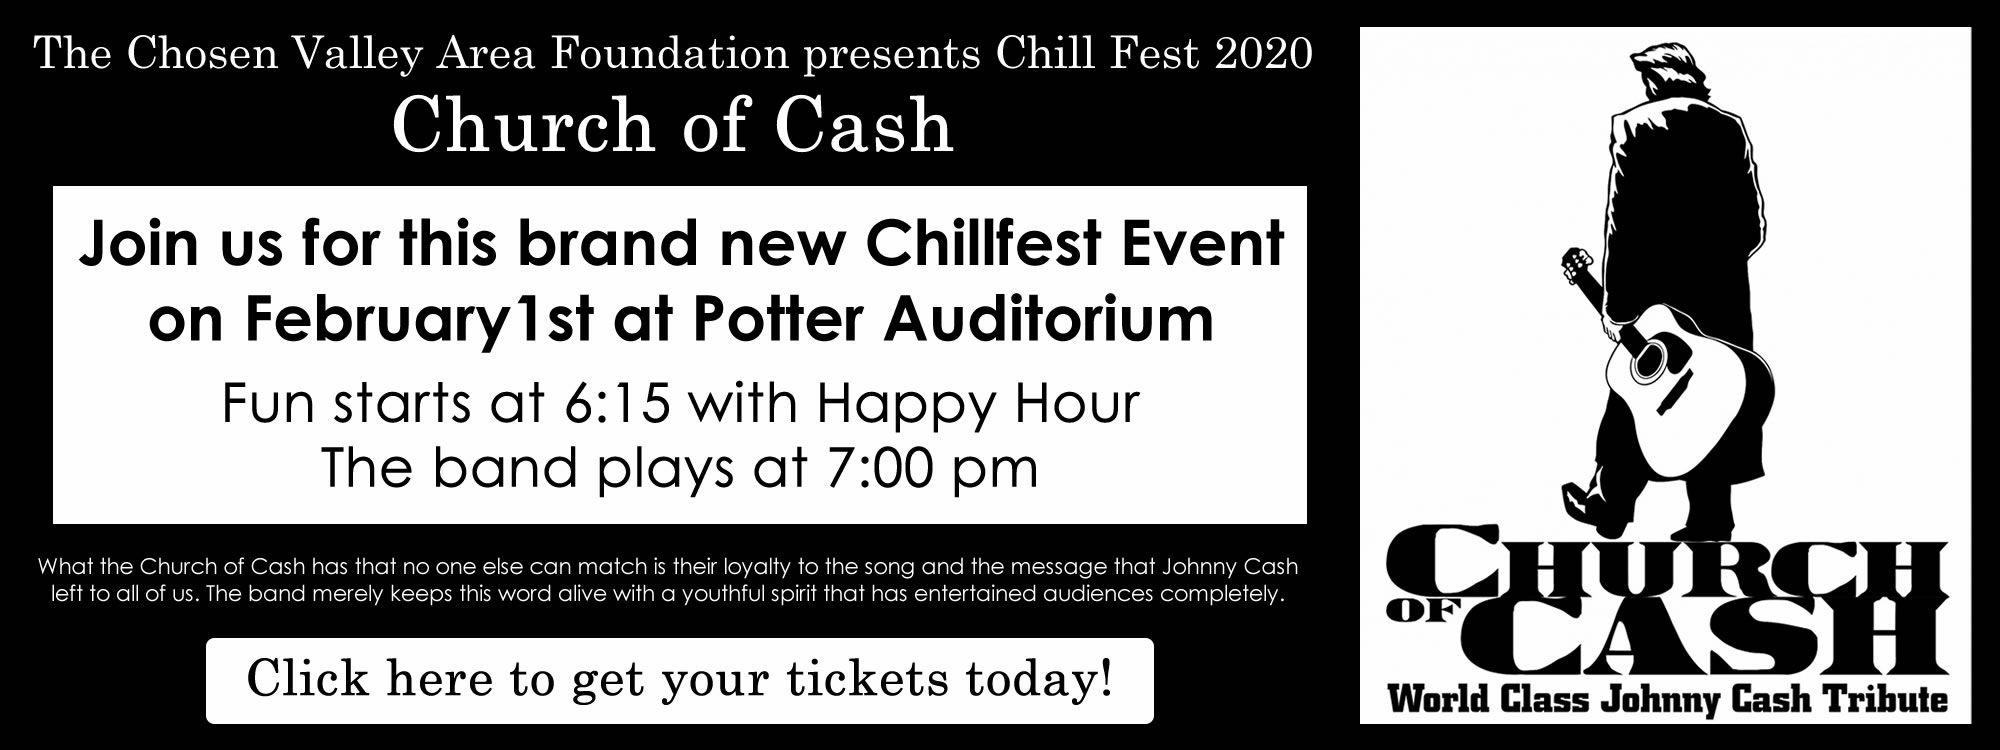 Chosen Valley Community Foundaiton - Chill Fest 2020 - Church of Cash concert